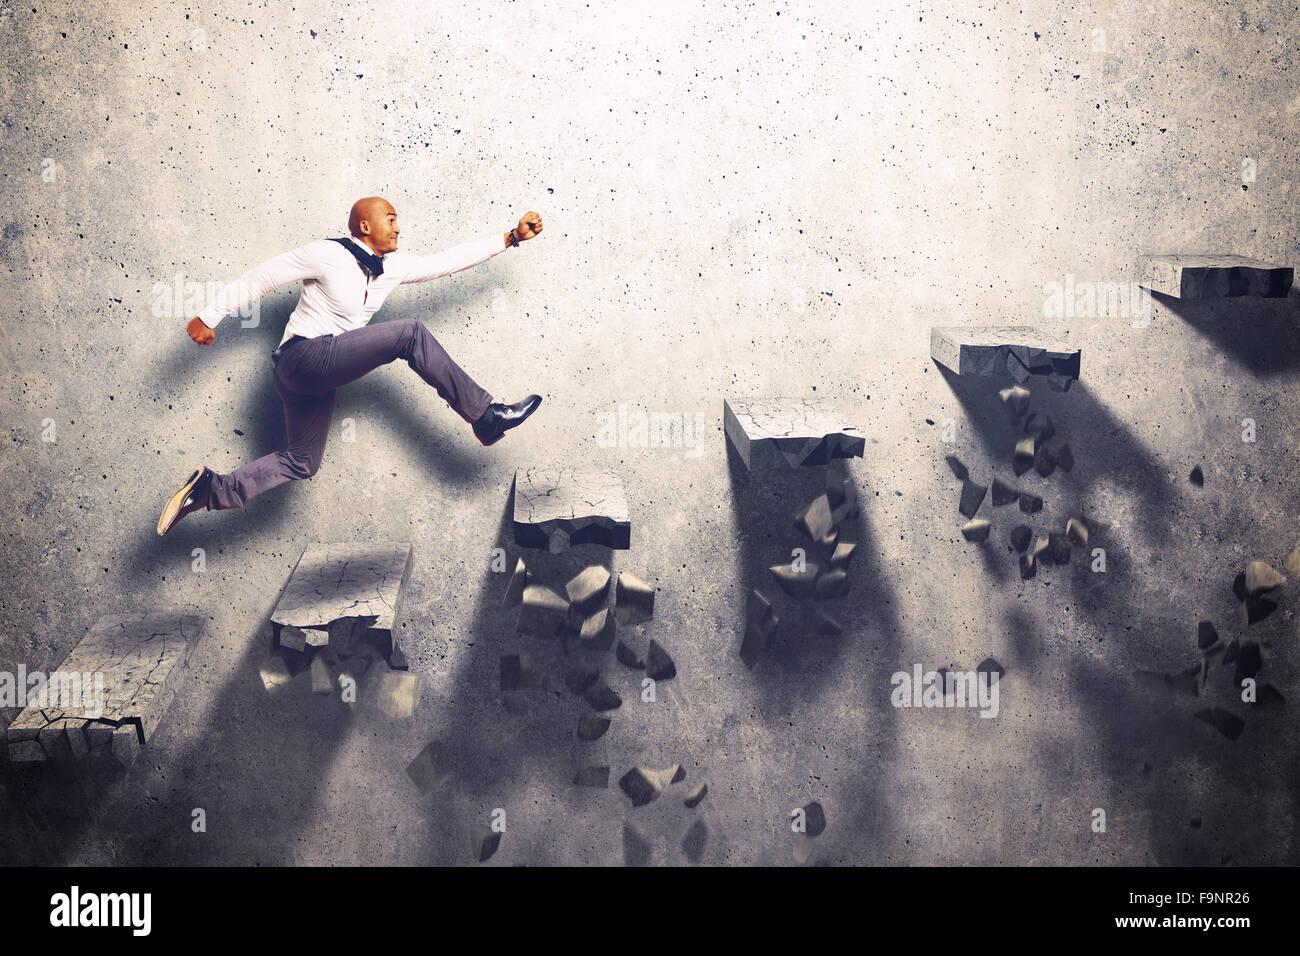 Uncertain climb - Stock Image